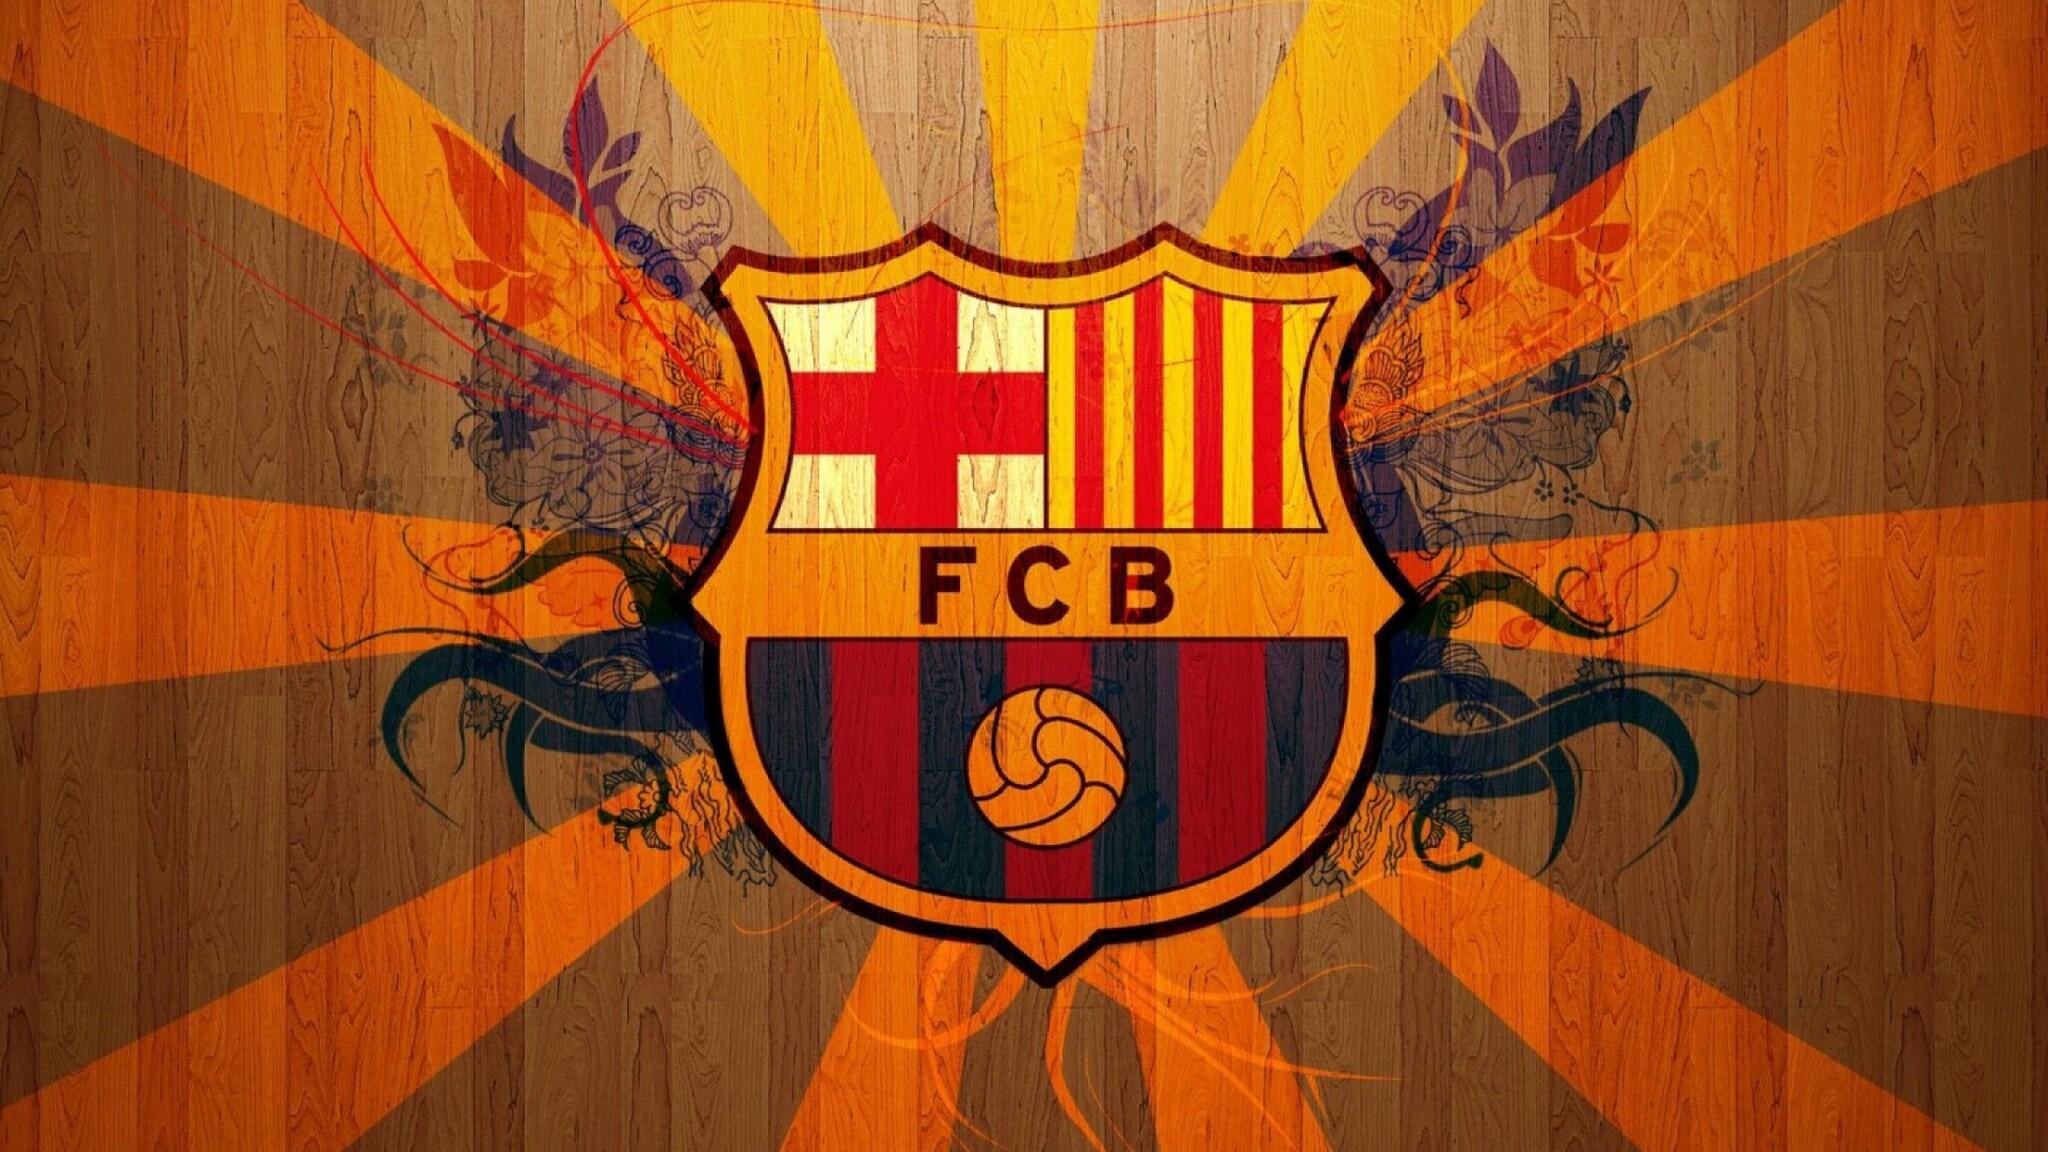 2048x1152 fc barcelona logo 2048x1152 resolution hd 4k wallpapers fc barcelona logog biocorpaavc